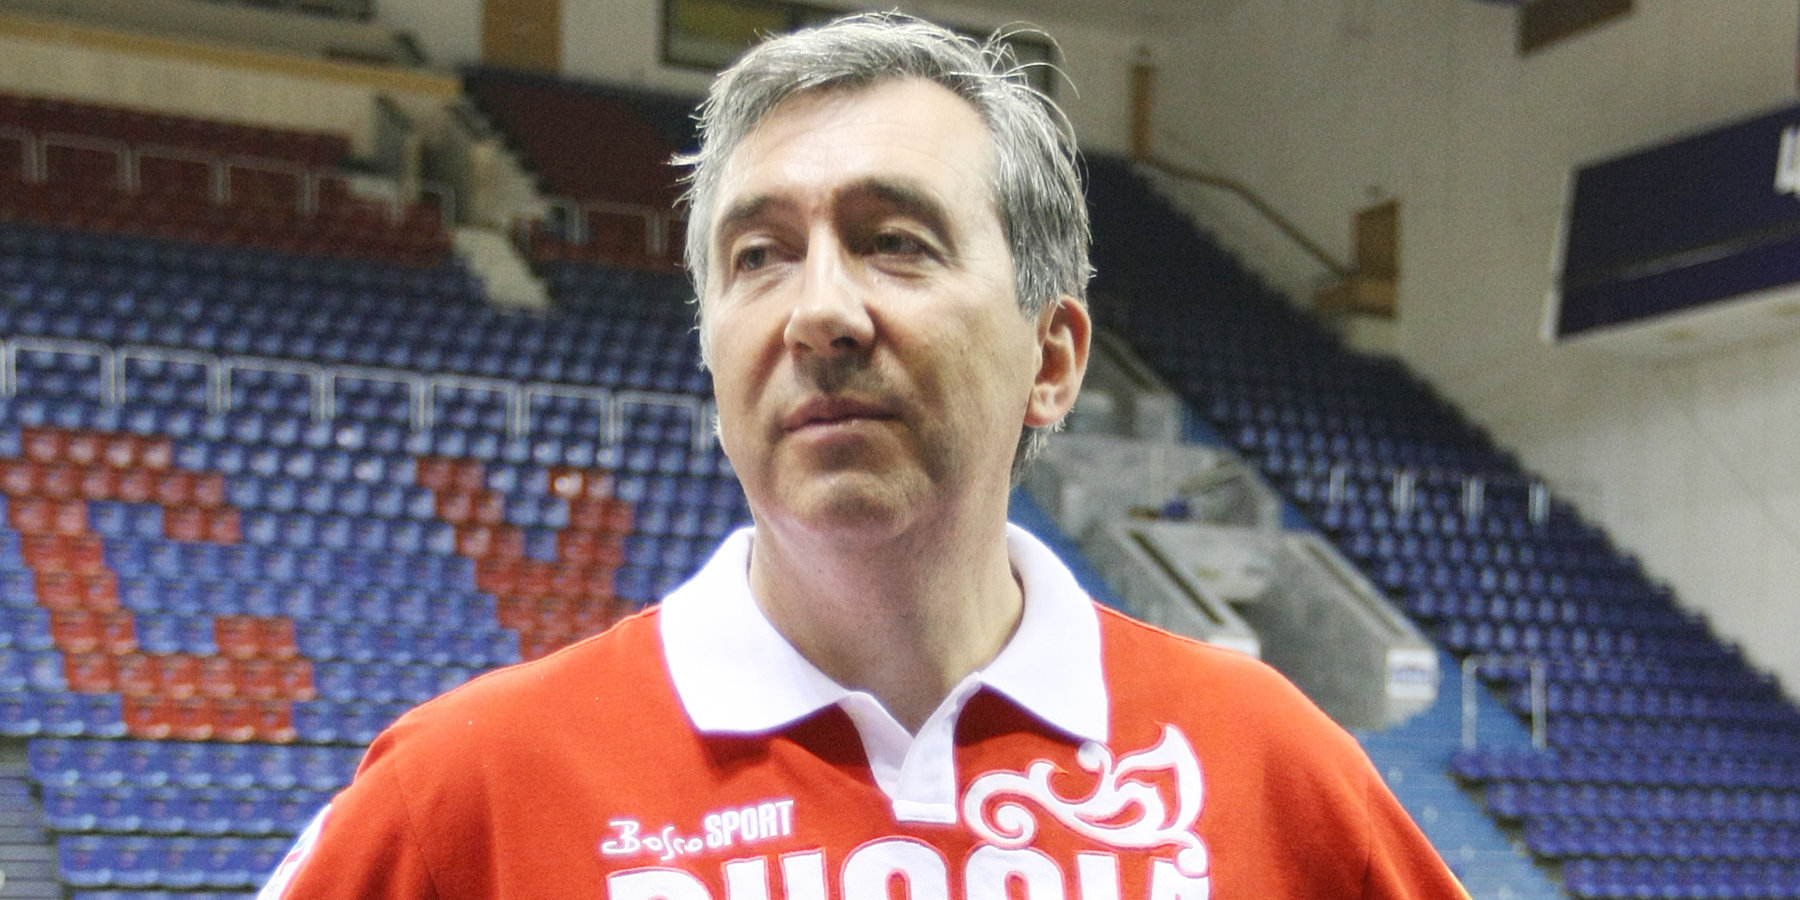 Тараканов избран в Зал славы ФИБА